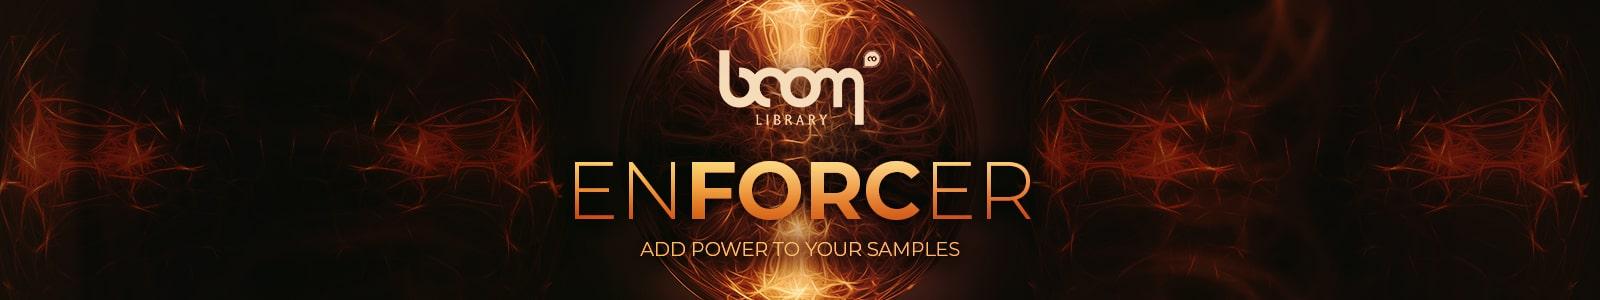 Boom Library Enforcer